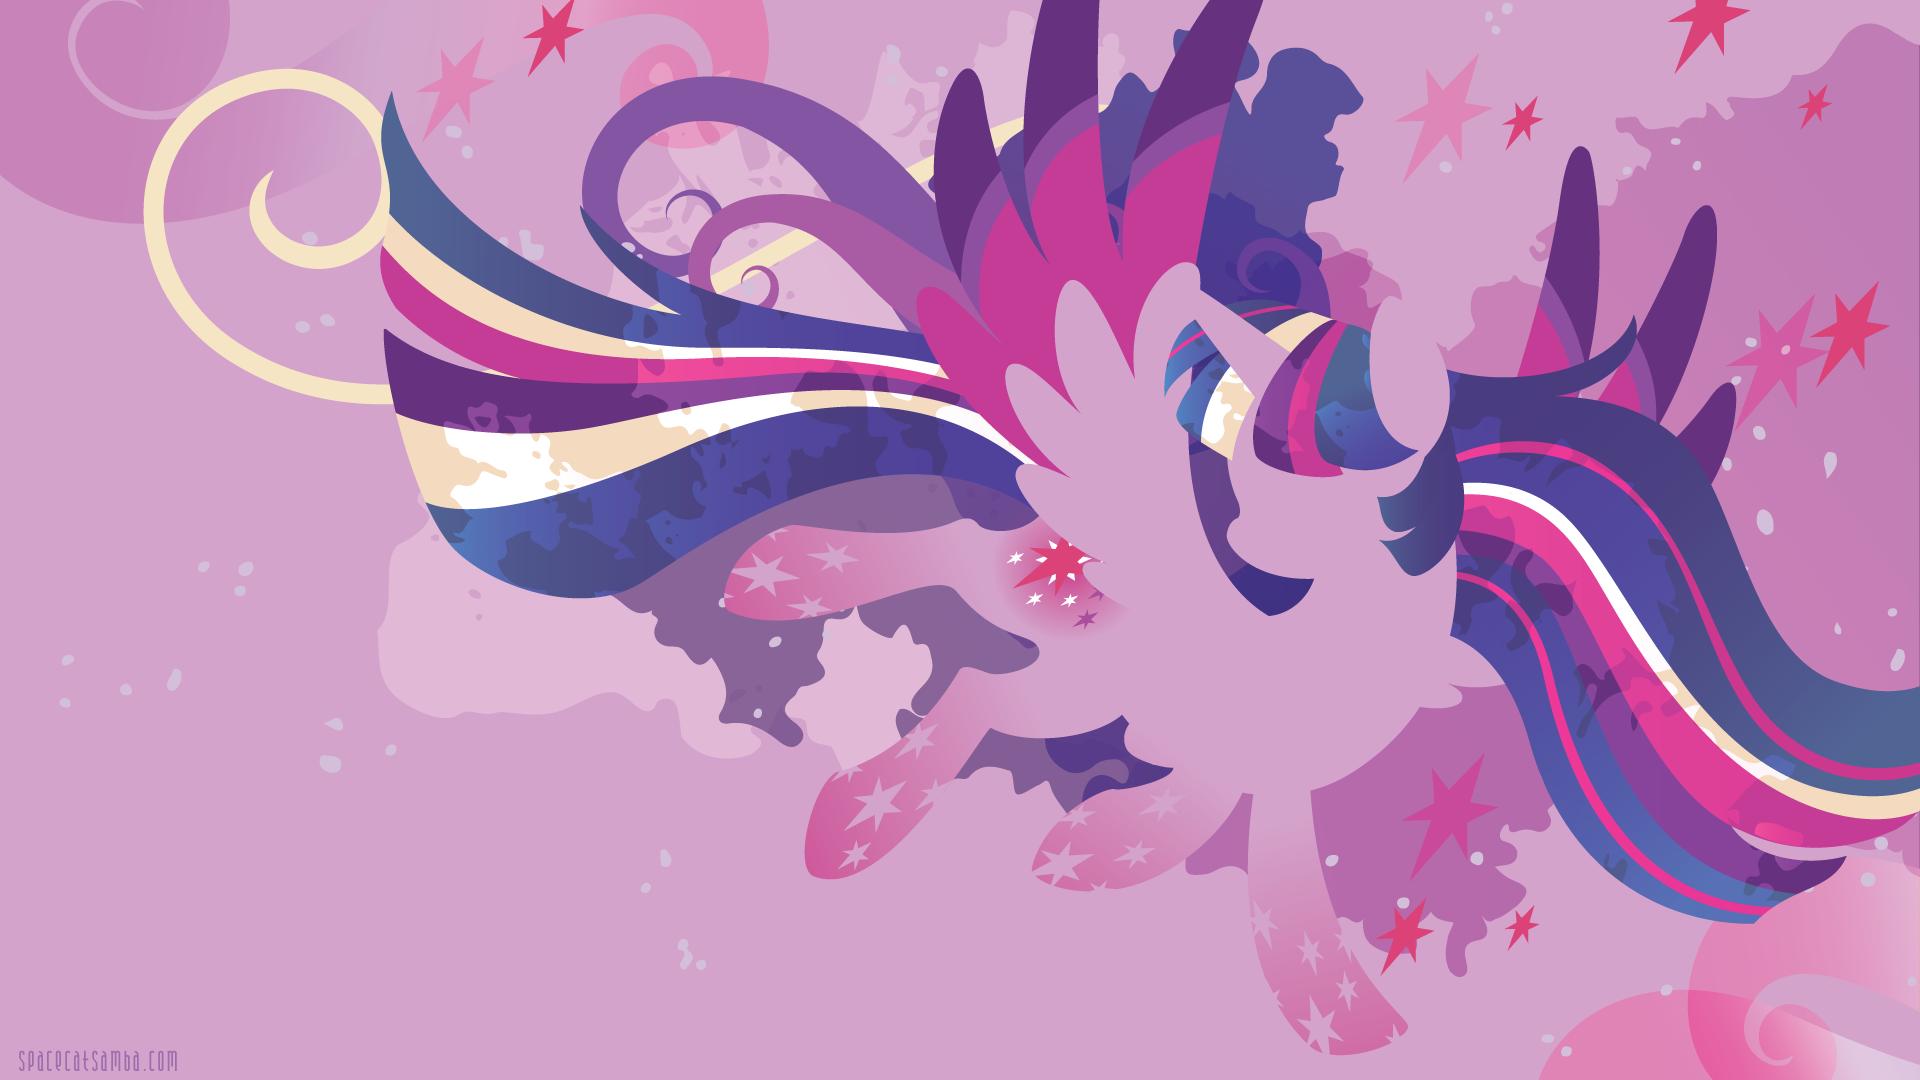 Rainbow Power Twilight Sparkle Silhouette Wall Spacecatsamba Com